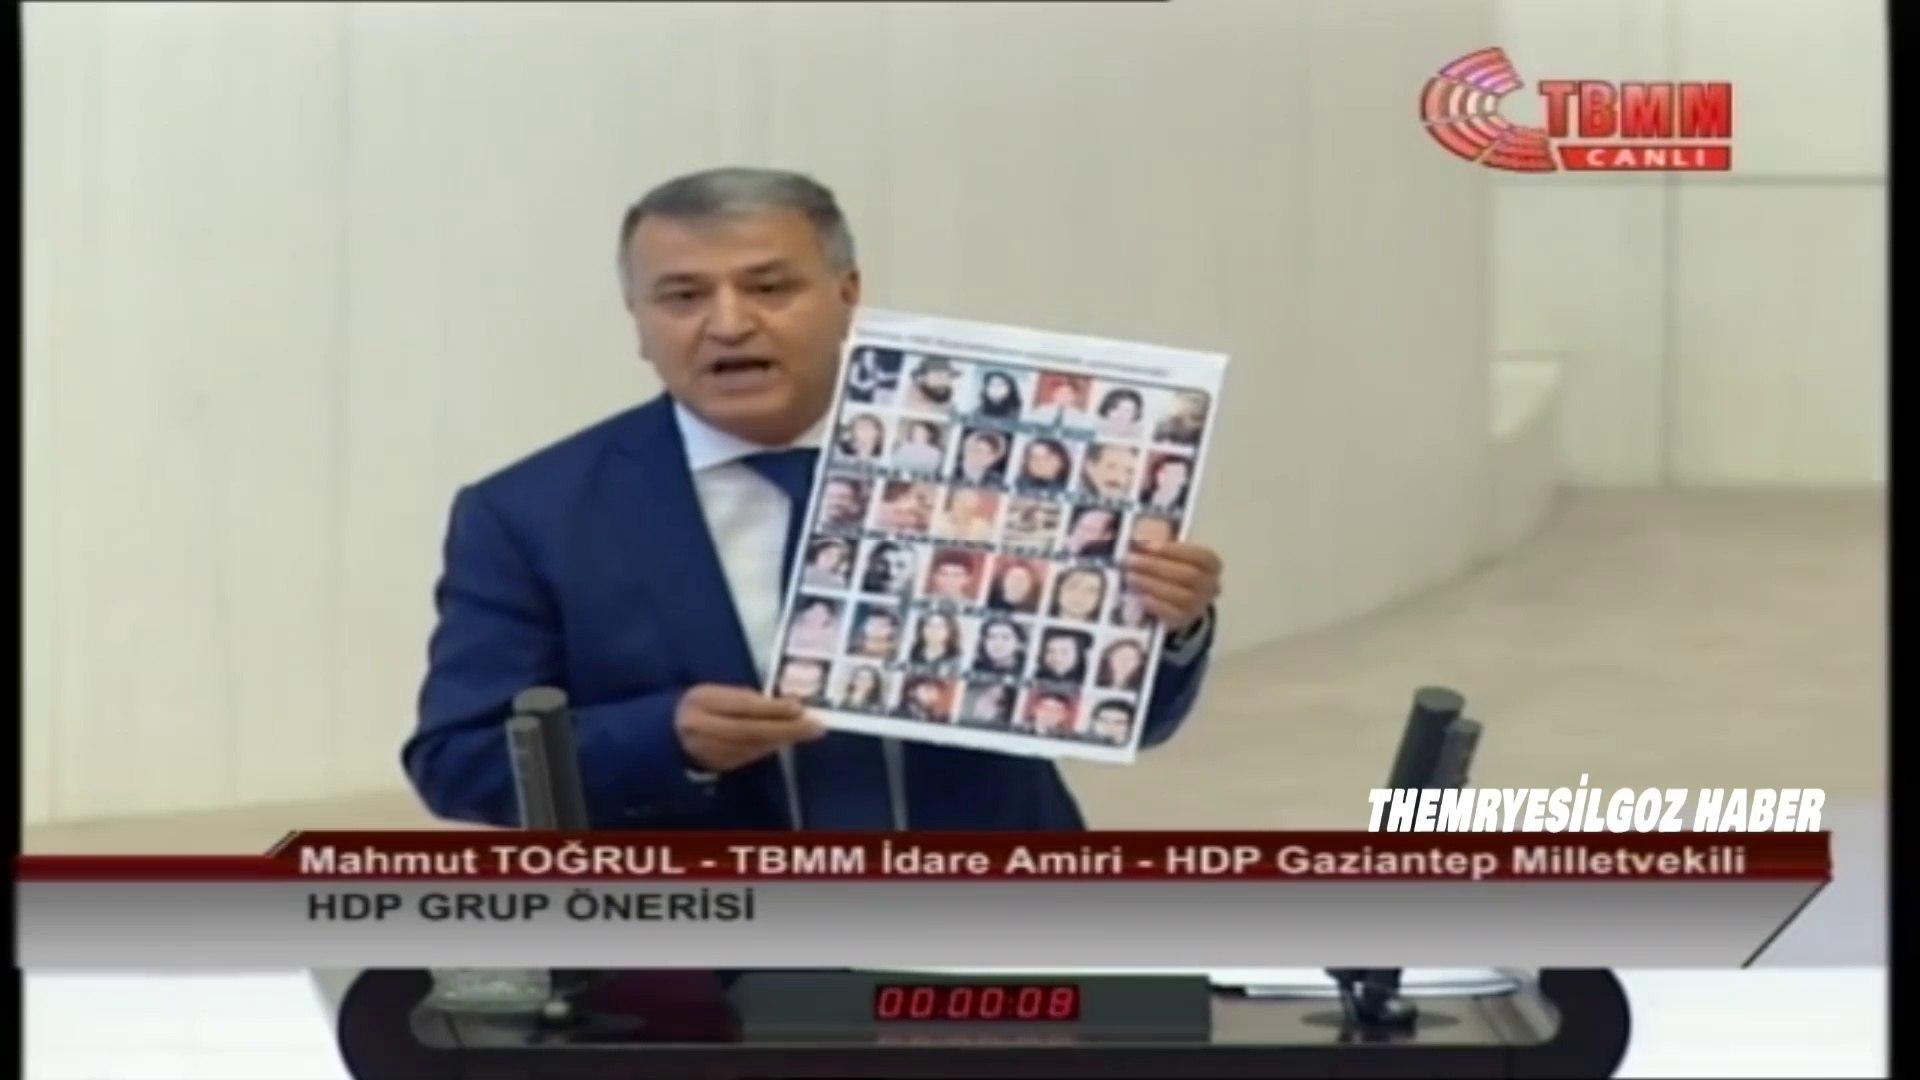 Hdp Gaziantep Milletvekili Tbmm Idare Amiri Mahmut Togrul Meclis Konusmasi Hdp Grup Onerisi 2 Temmuz 2019